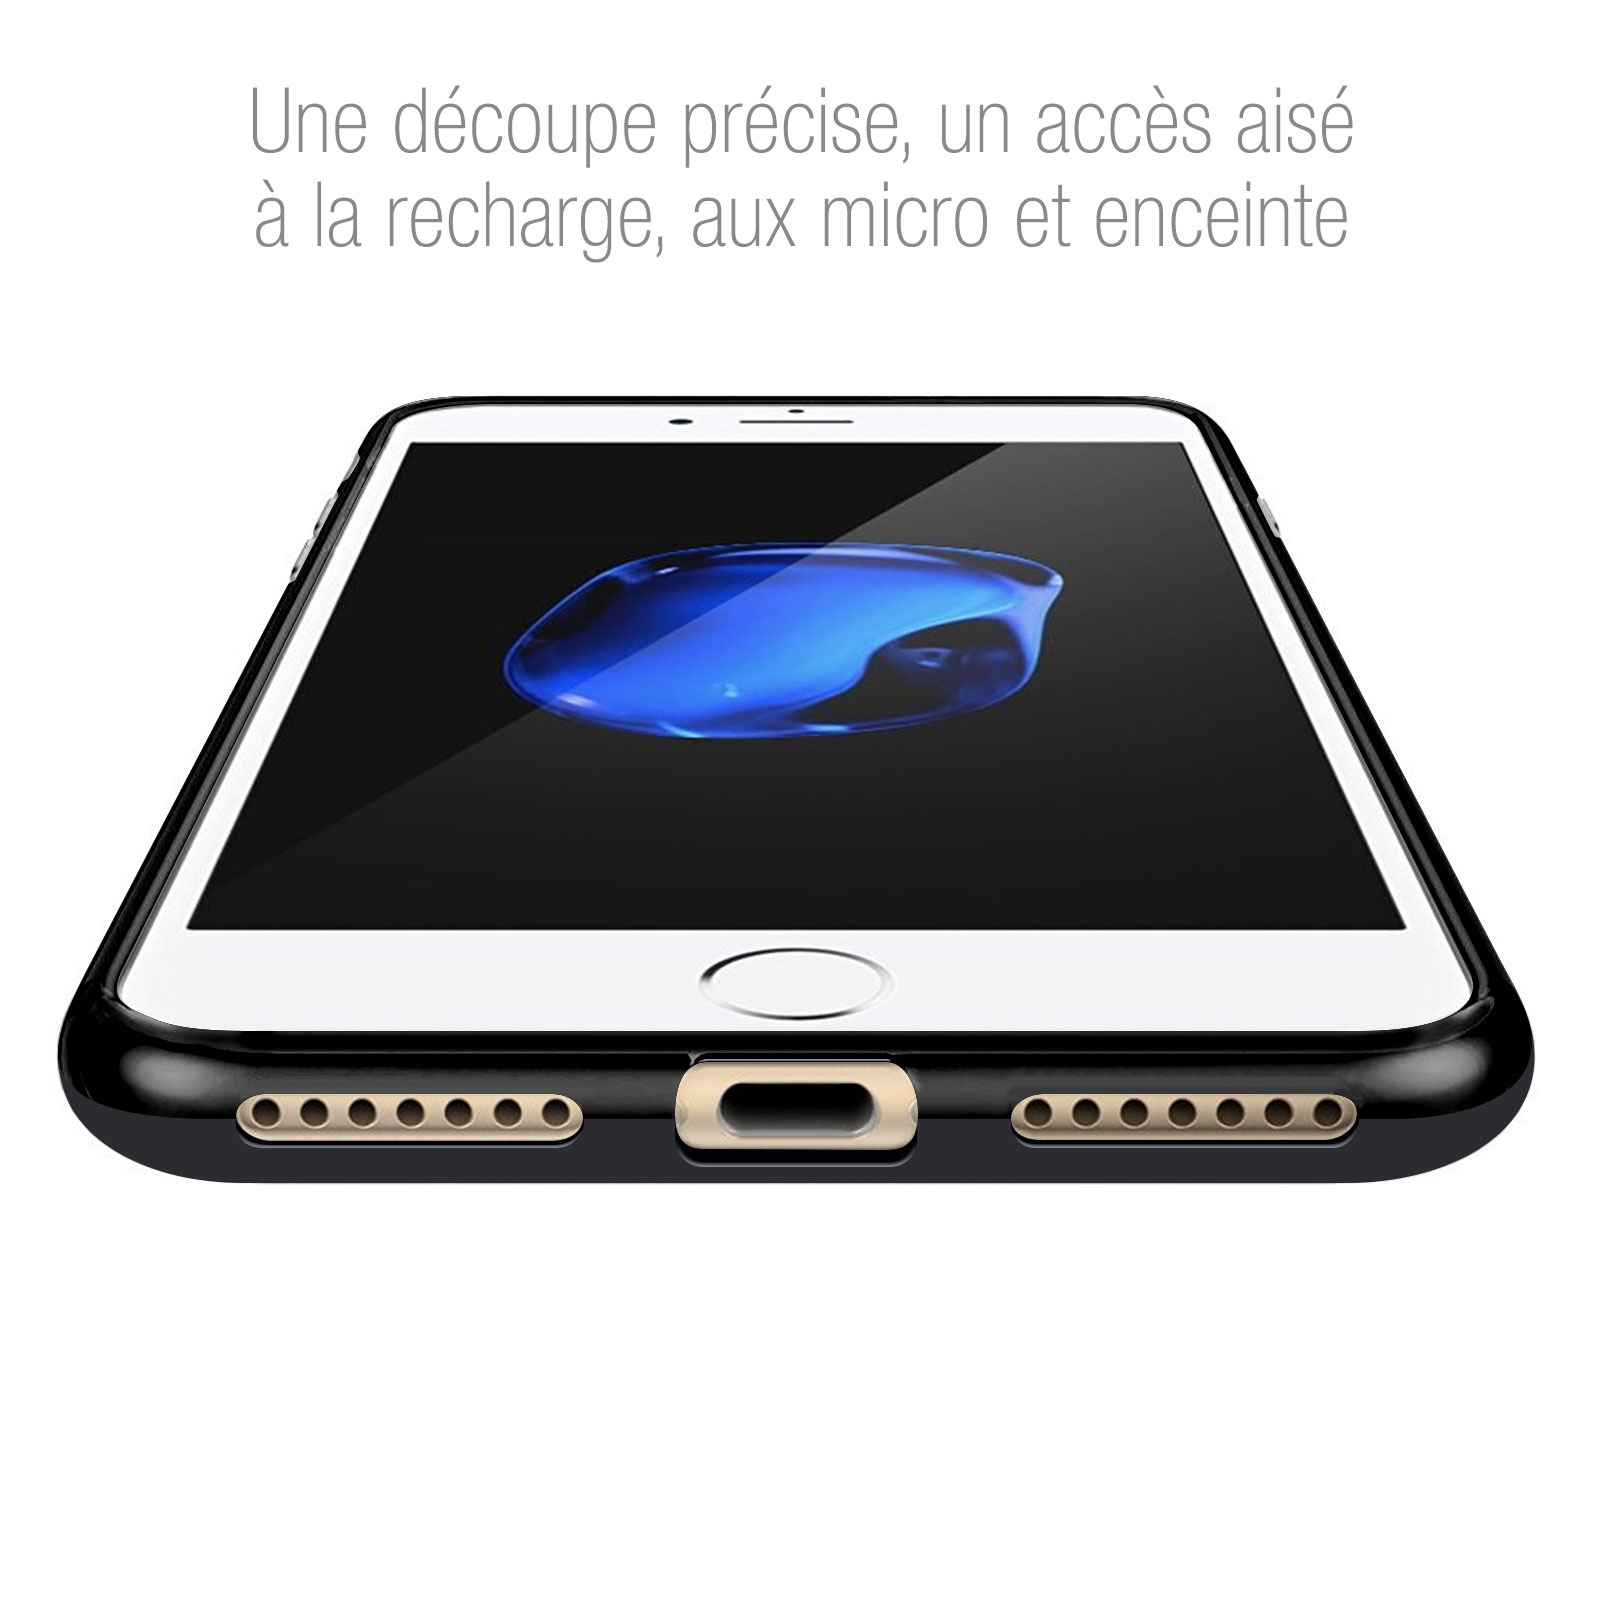 Coque iPhone 7/8 Plus Frozen Ice Extra Fine Noir opaque